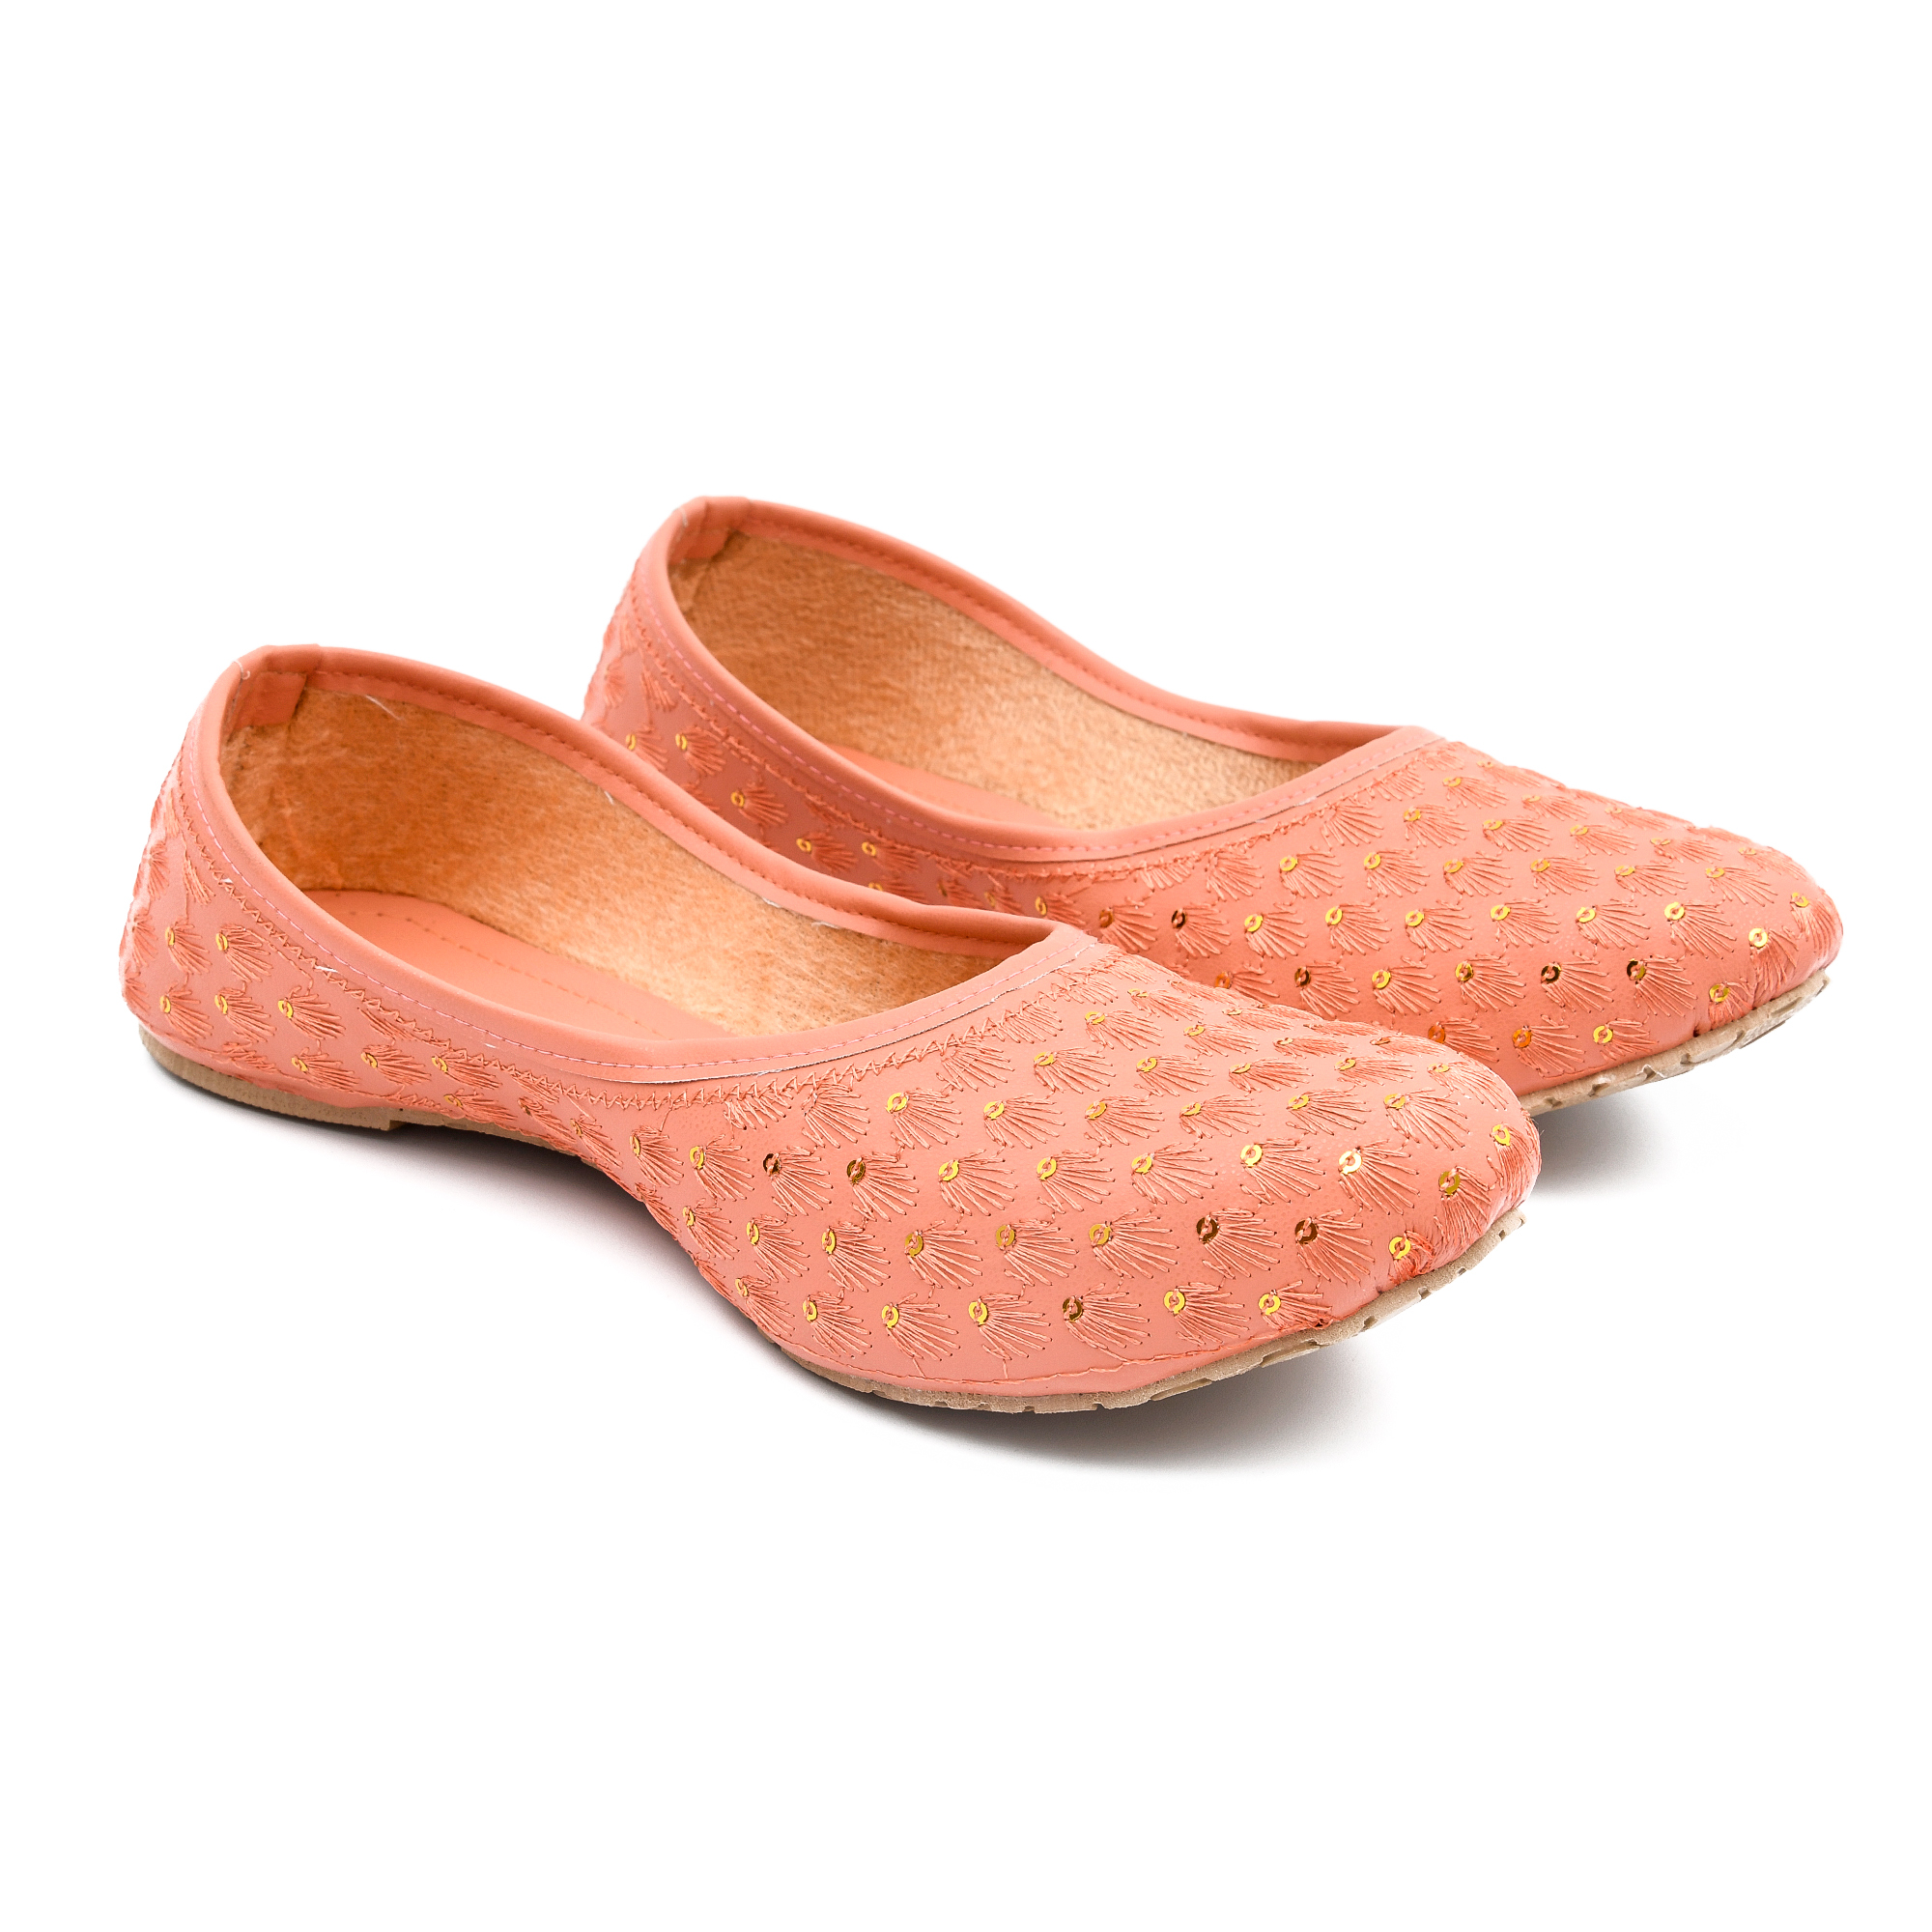 Women Shoes Jutties Indian Handmade Traditional Pink Leather Ballet Flats Mojari